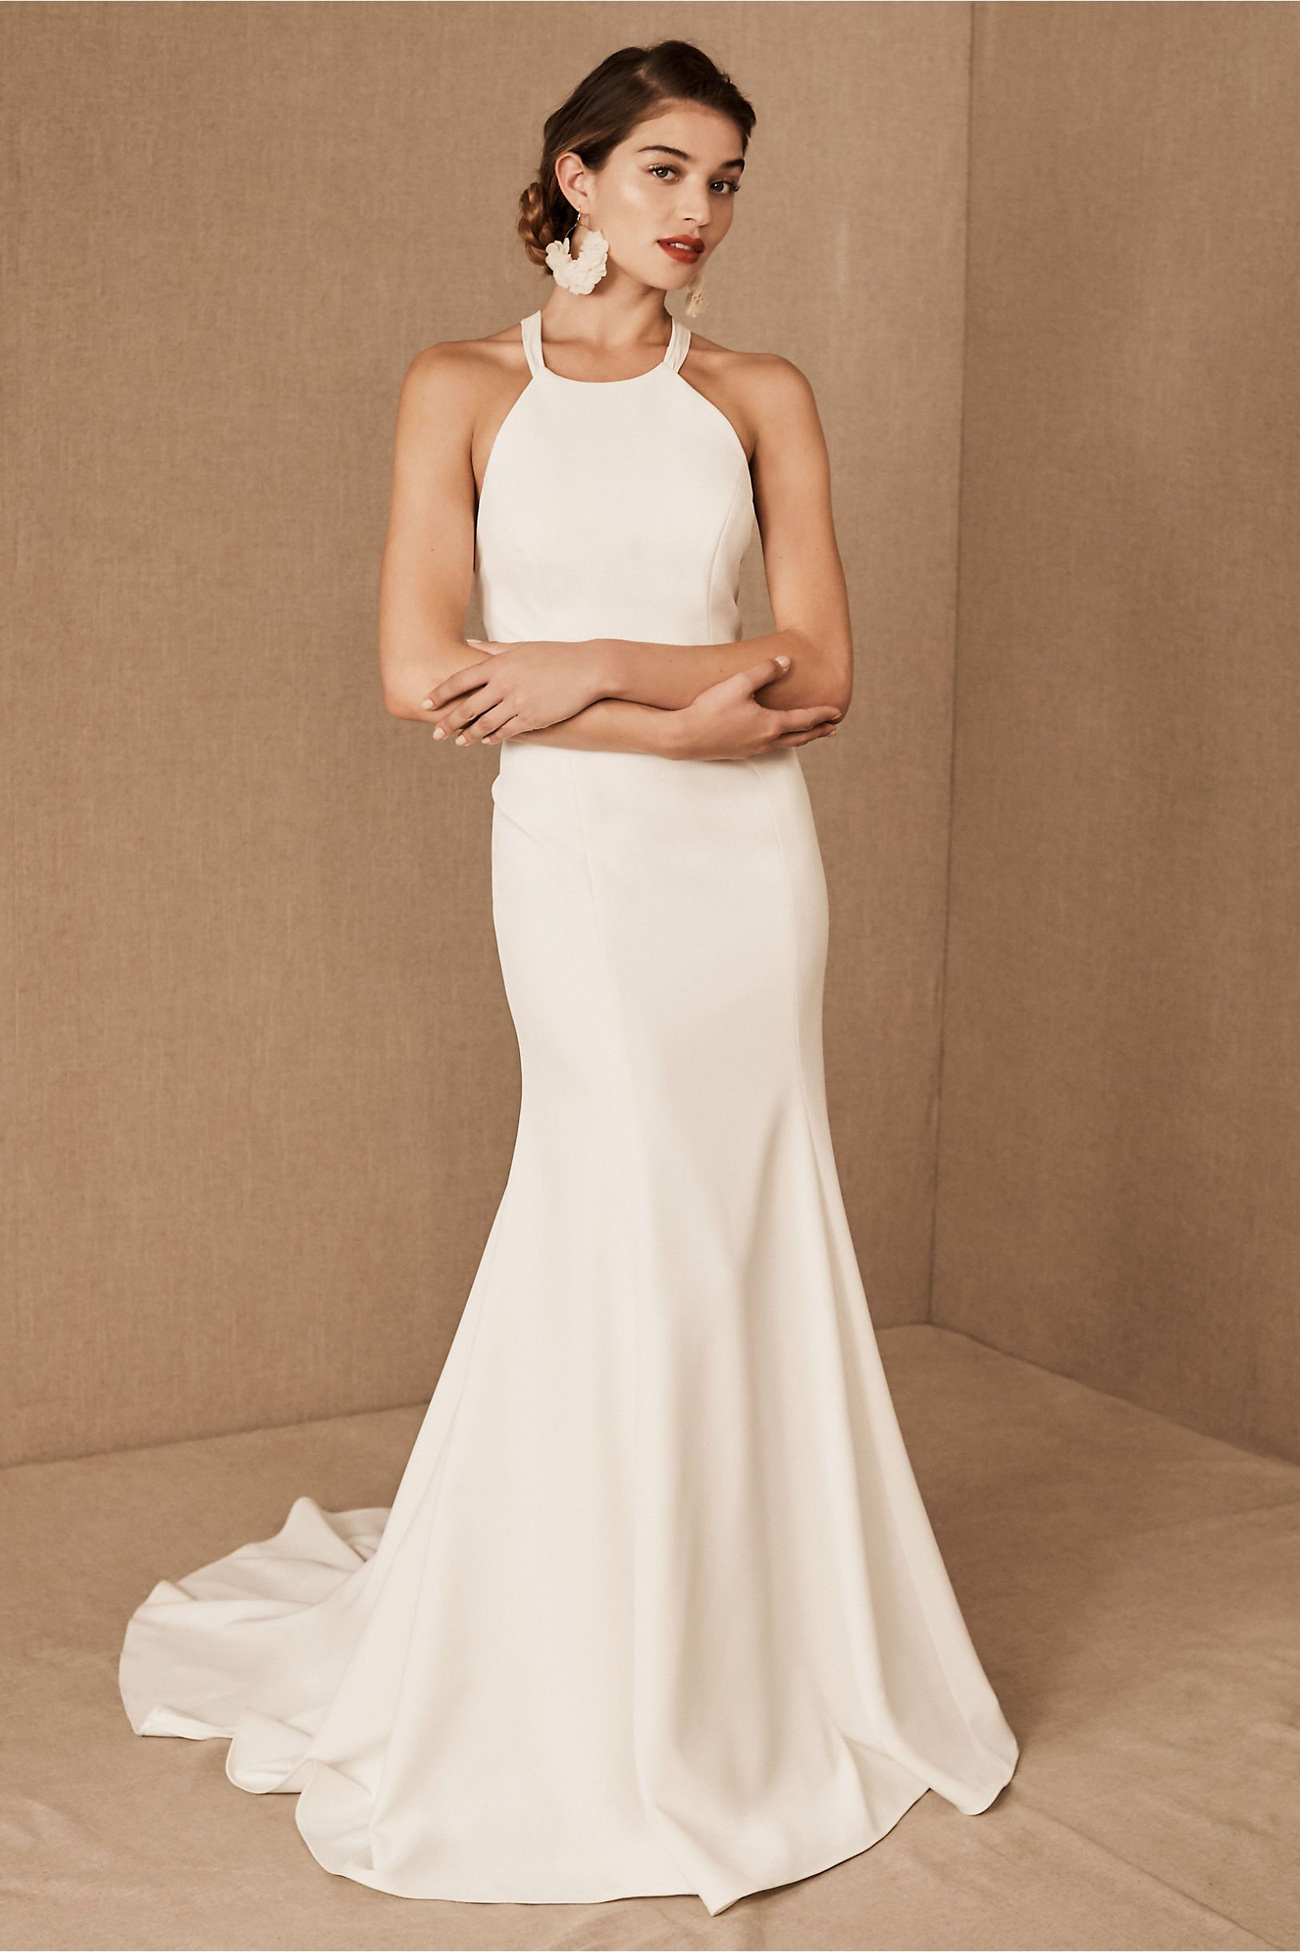 Sleek BHLDN 2020 Gown